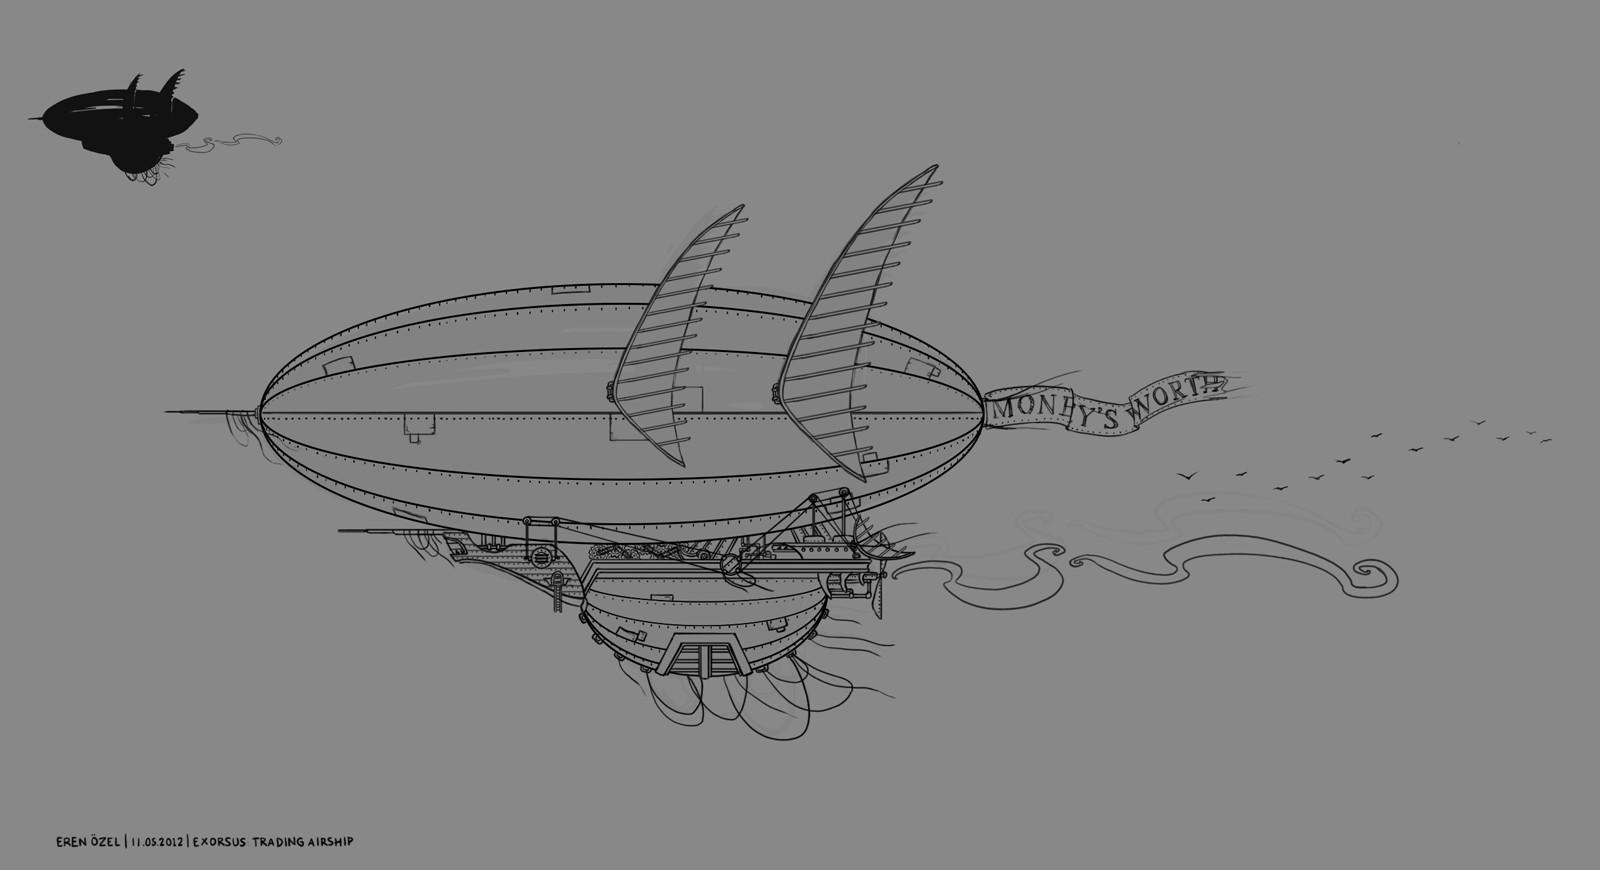 Eren ozel trading airship 1600x870